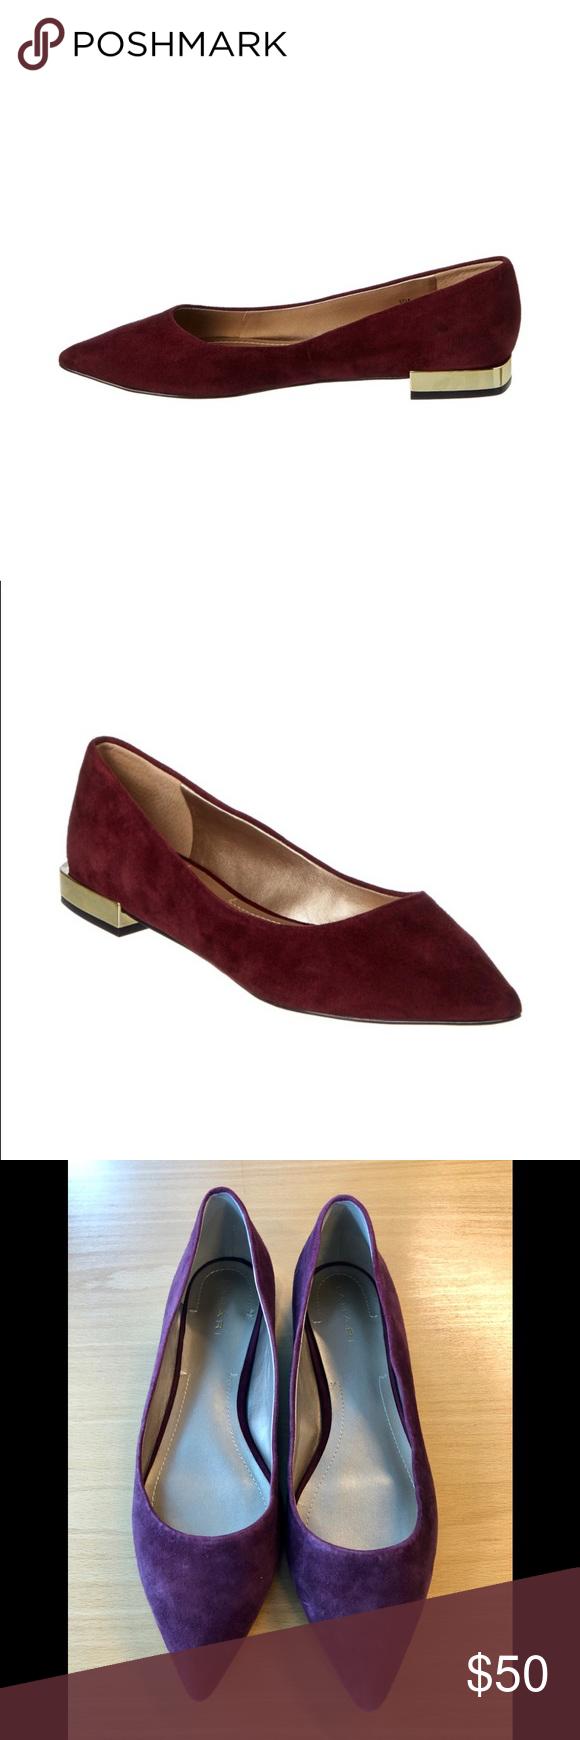 b3de4f0664f Tahari Pointed Toe Eda Flats, 8.5 | My Posh Closet | Fashion flats ...